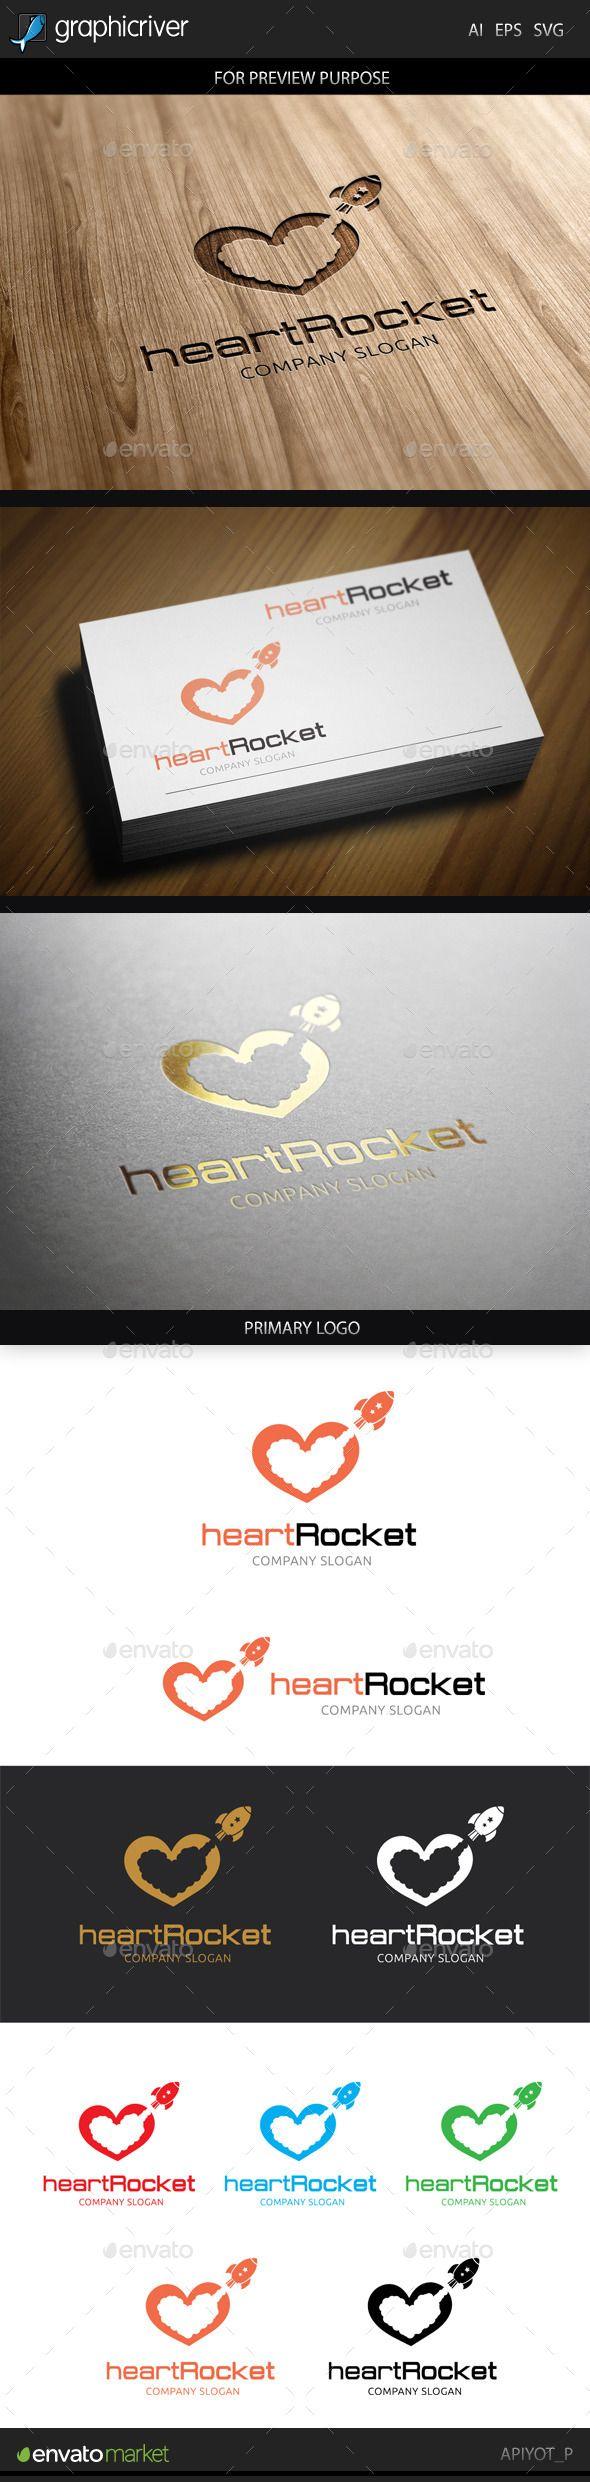 Heart Rocket Logo — Vector EPS #unlimited #multimedia • Available here → https://graphicriver.net/item/heart-rocket-logo/8881704?ref=pxcr